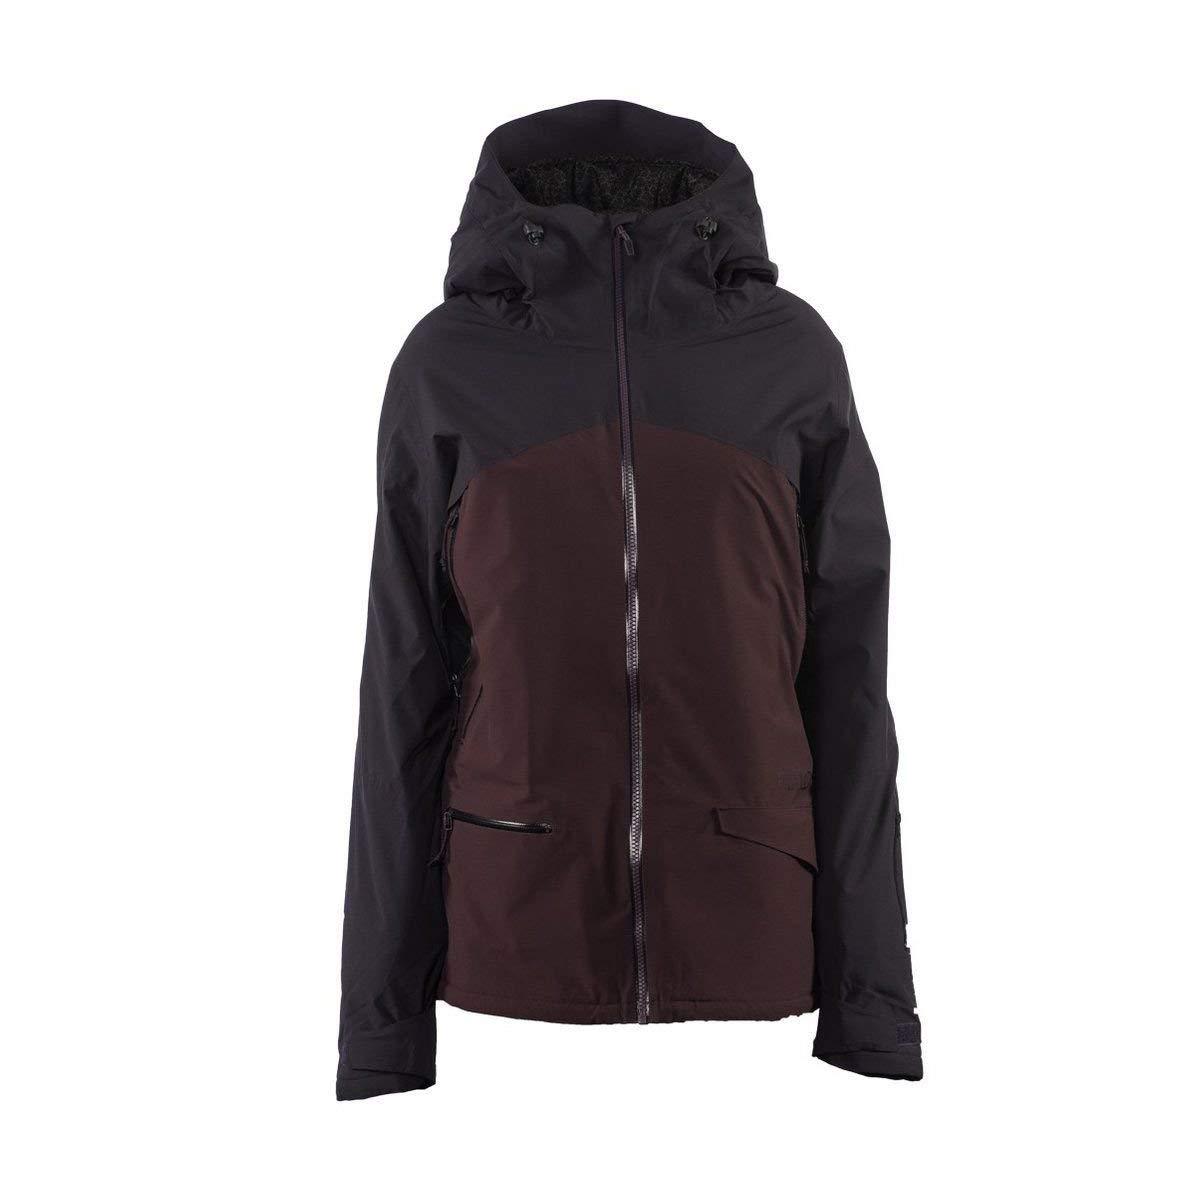 104269b9034 Get Quotations · FlyLow Gear Daphne Insulated Jacket - Women s